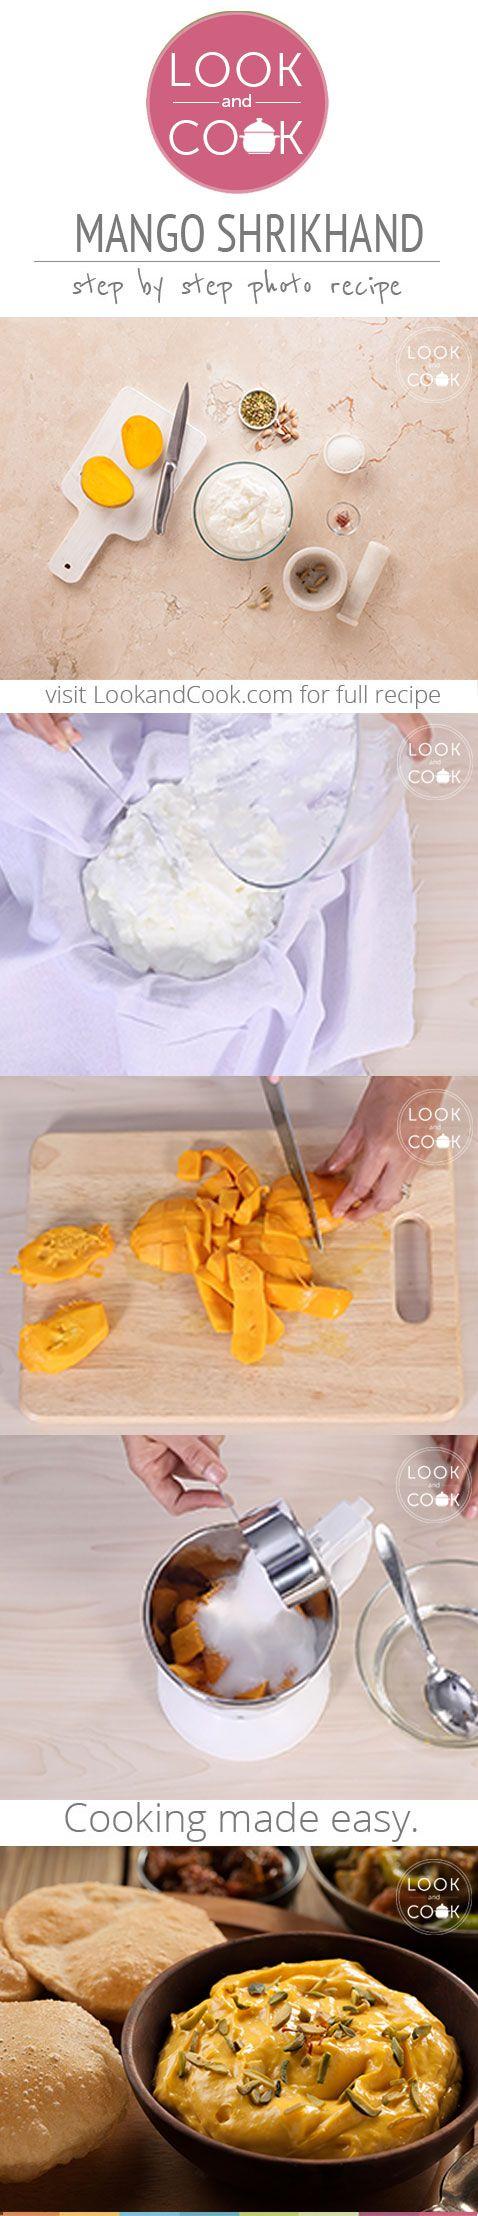 MANGO SHRIKHAND RECIPE (LC14302) : This recipe often made during the mango season is made of hung yogurt & mangoes.